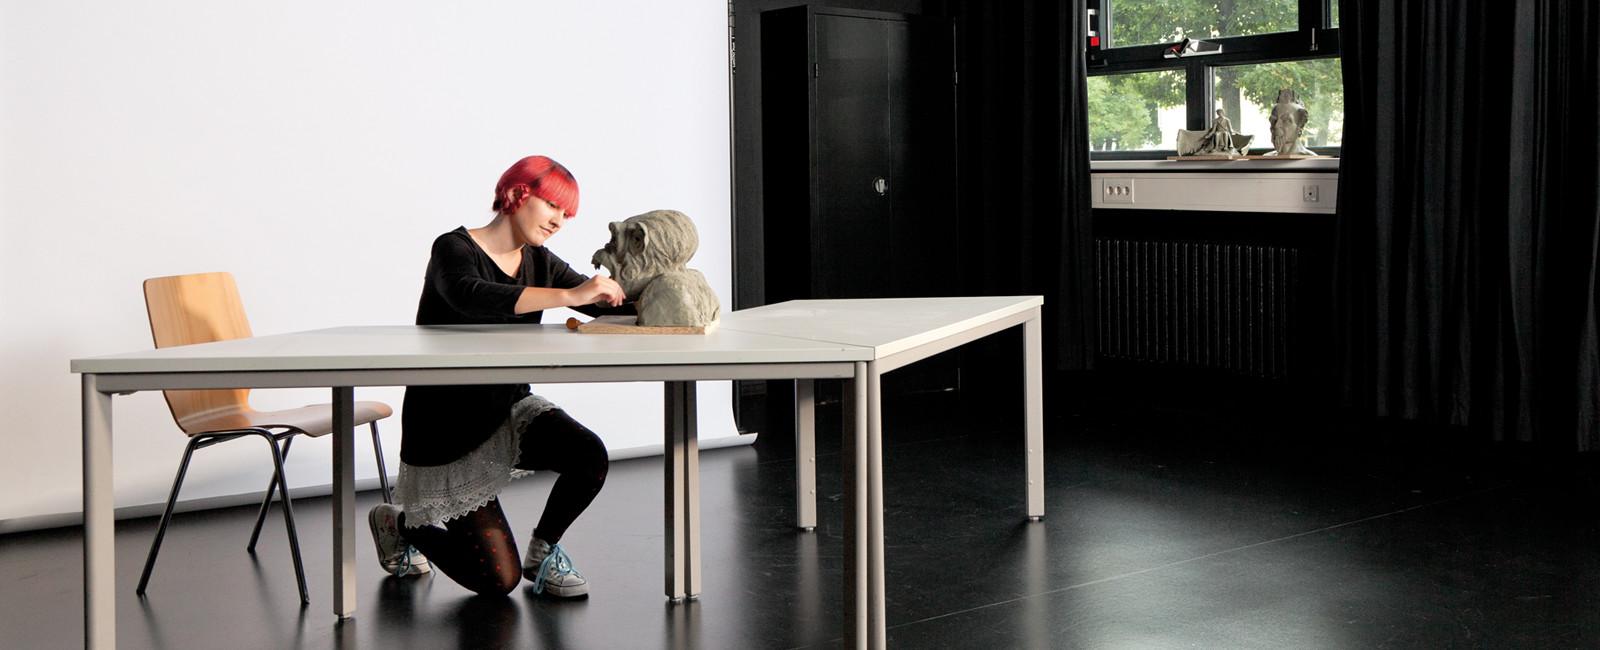 Laurea in game design berlino germania 2018 for Laurea in design